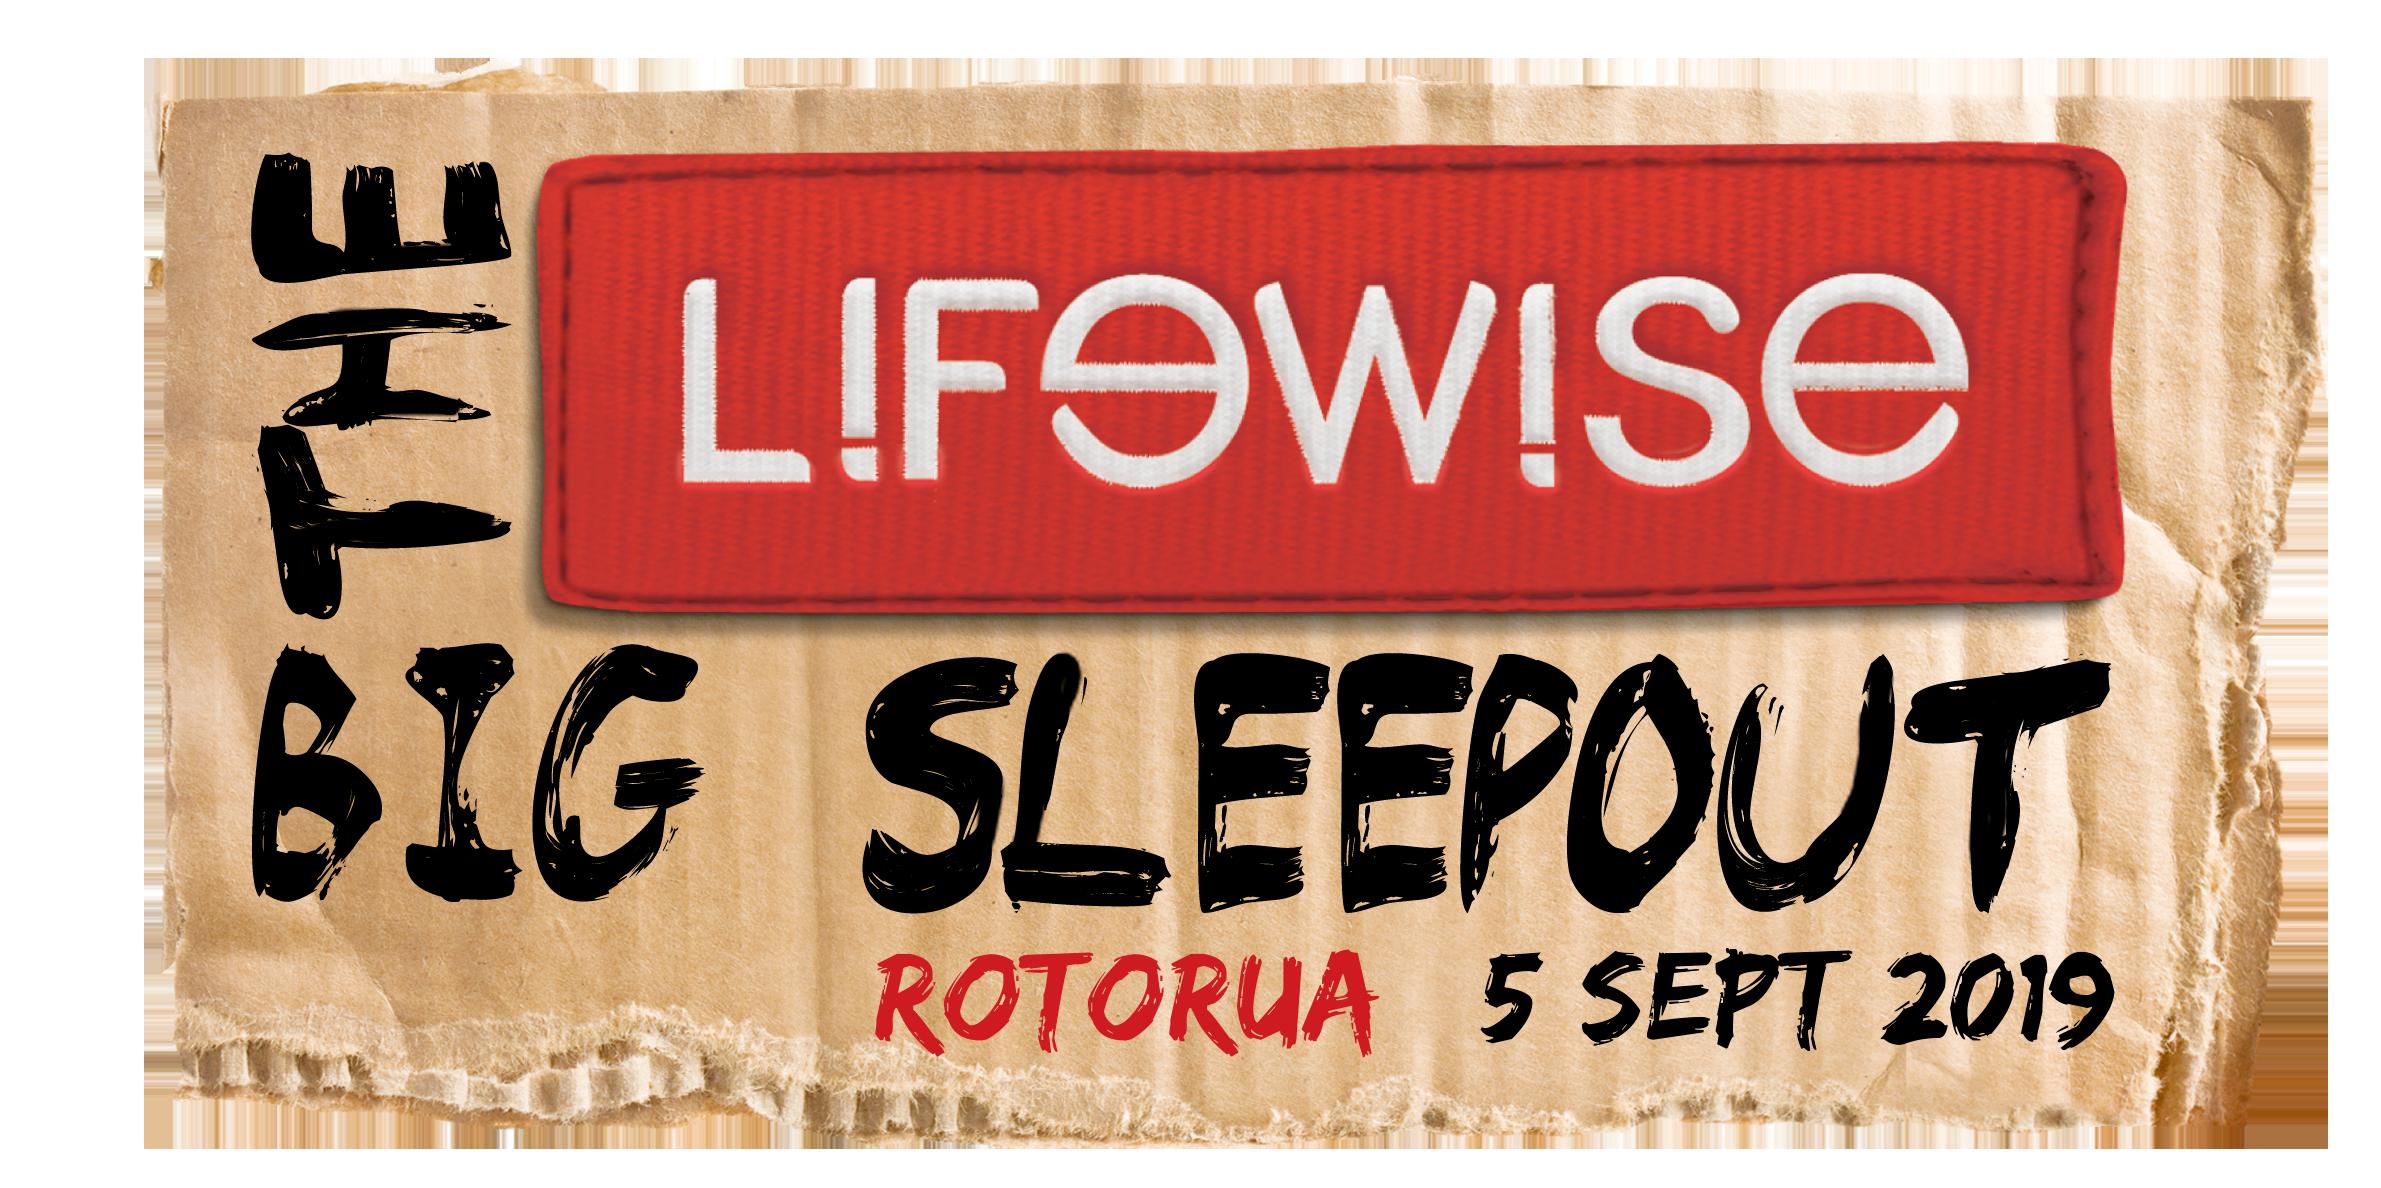 rotorua-sleep-out-image